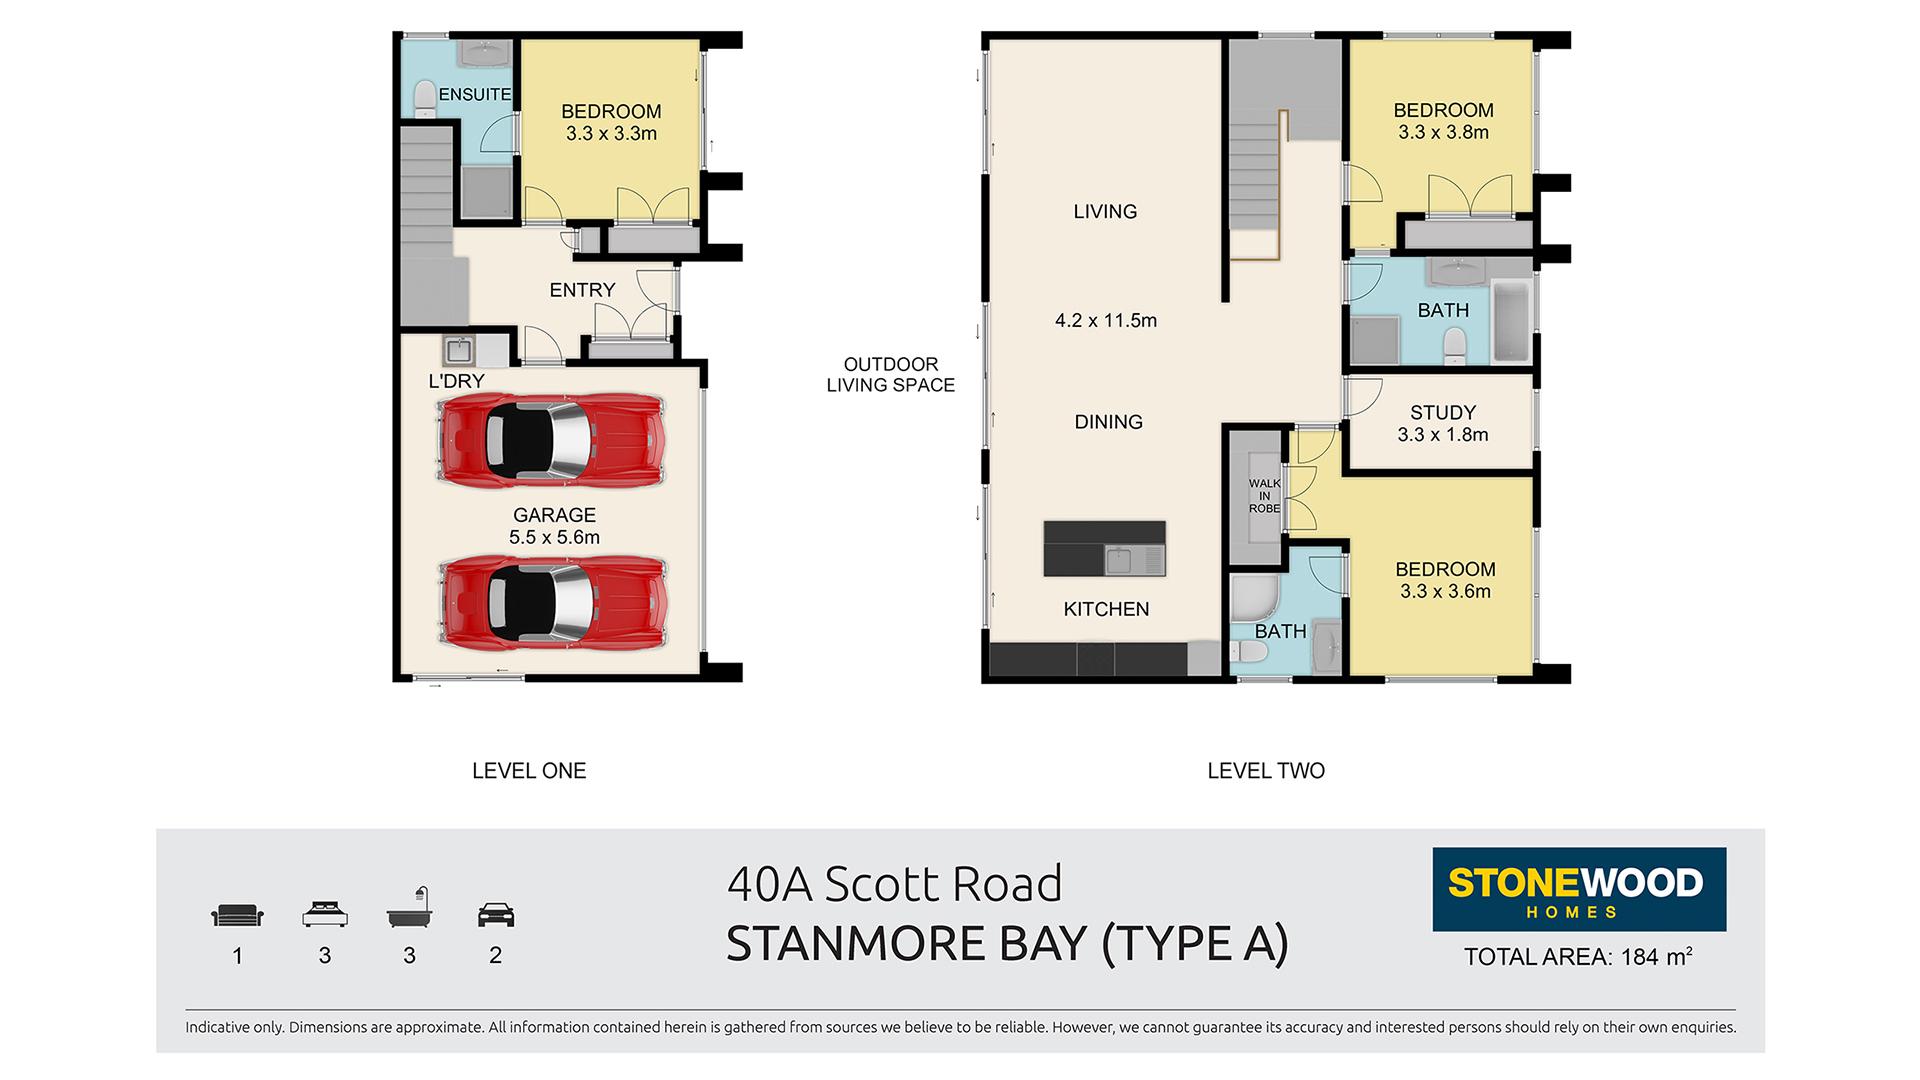 Type A Home blueprint